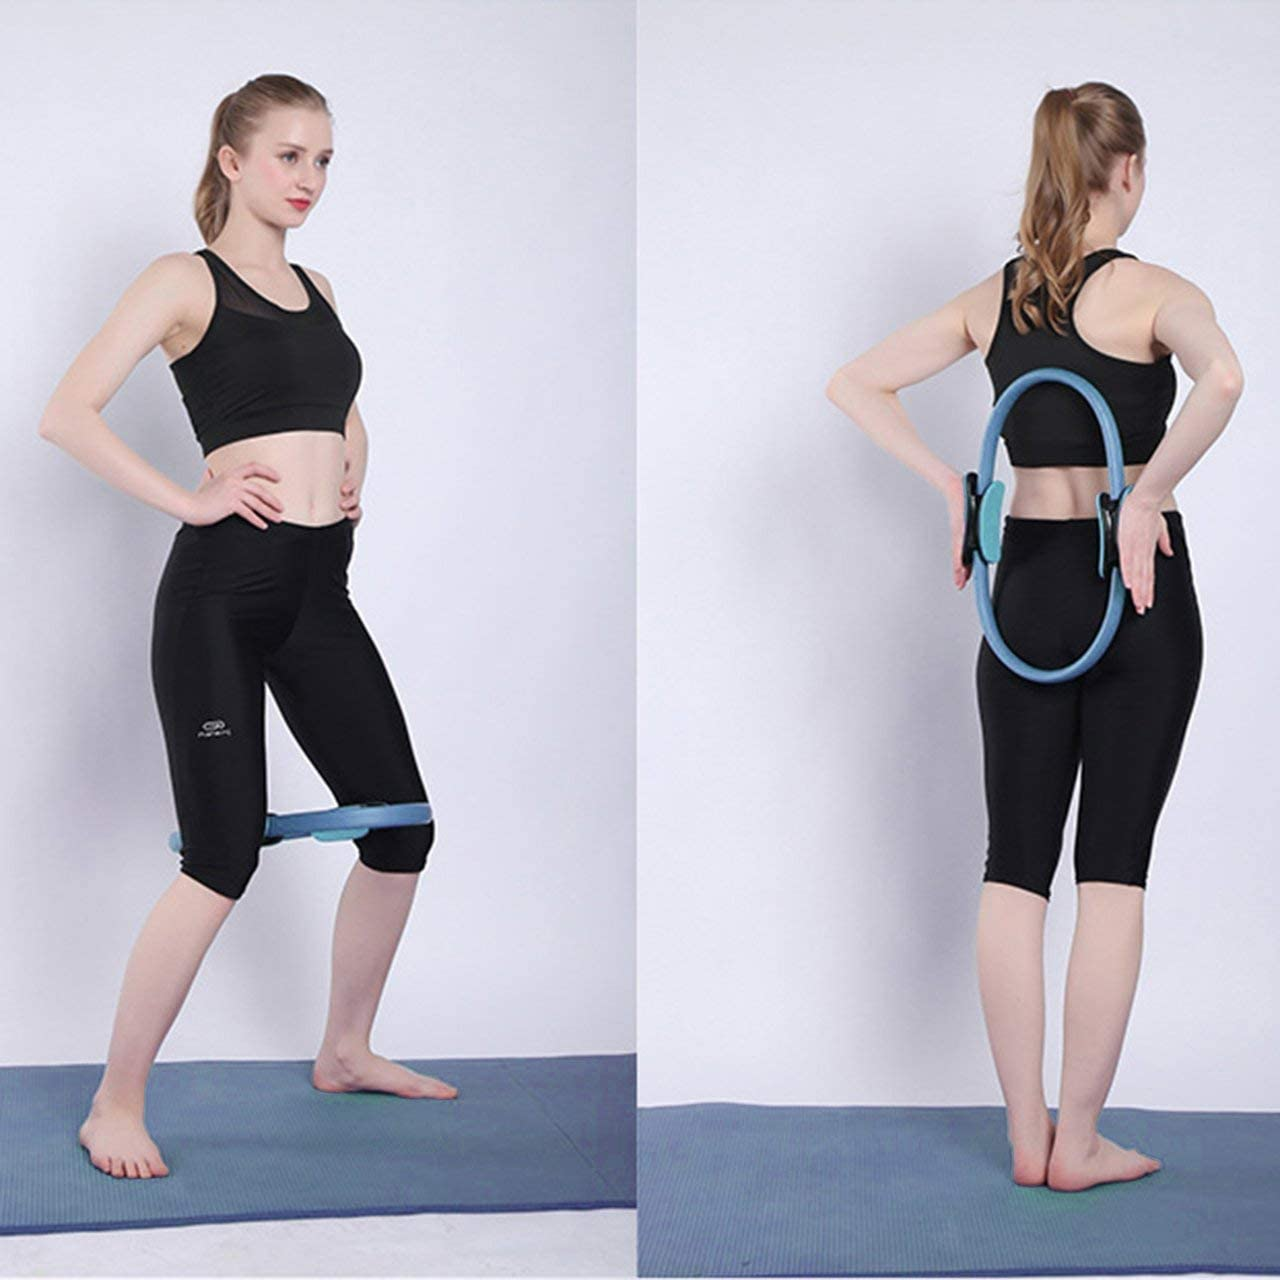 SZXCX Professionnel Fitness Magic Wrap Yoga Pilates Anneau Minceur Body Building Training Yoga Circle Gym Workout Training Tool Bleu